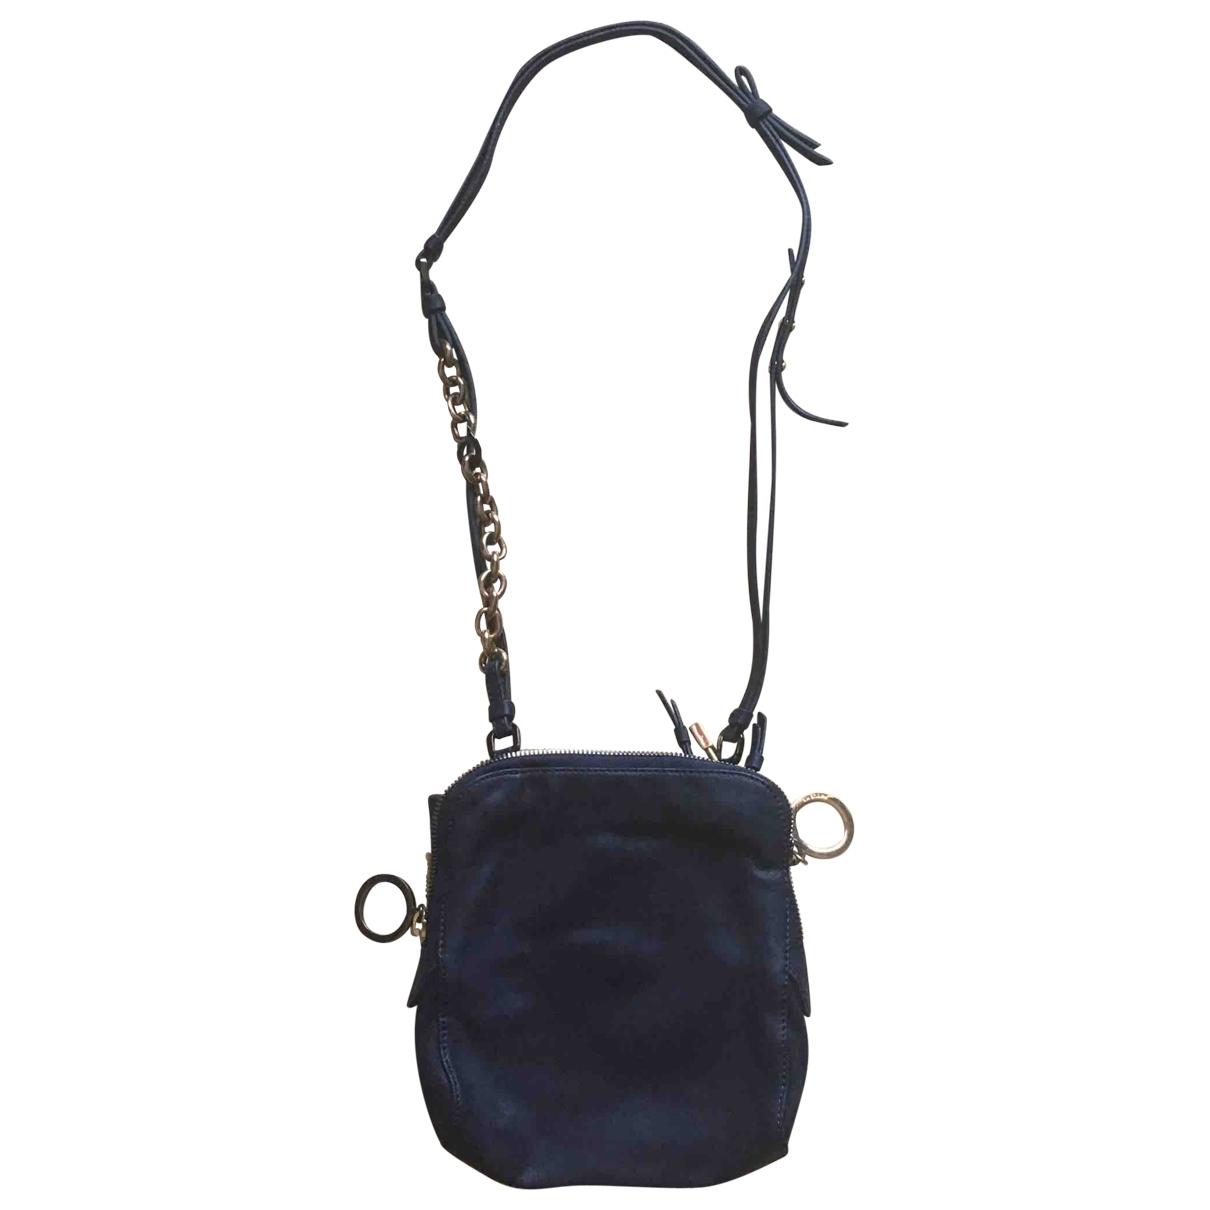 Paule Ka \N Handtasche in  Schwarz Leder